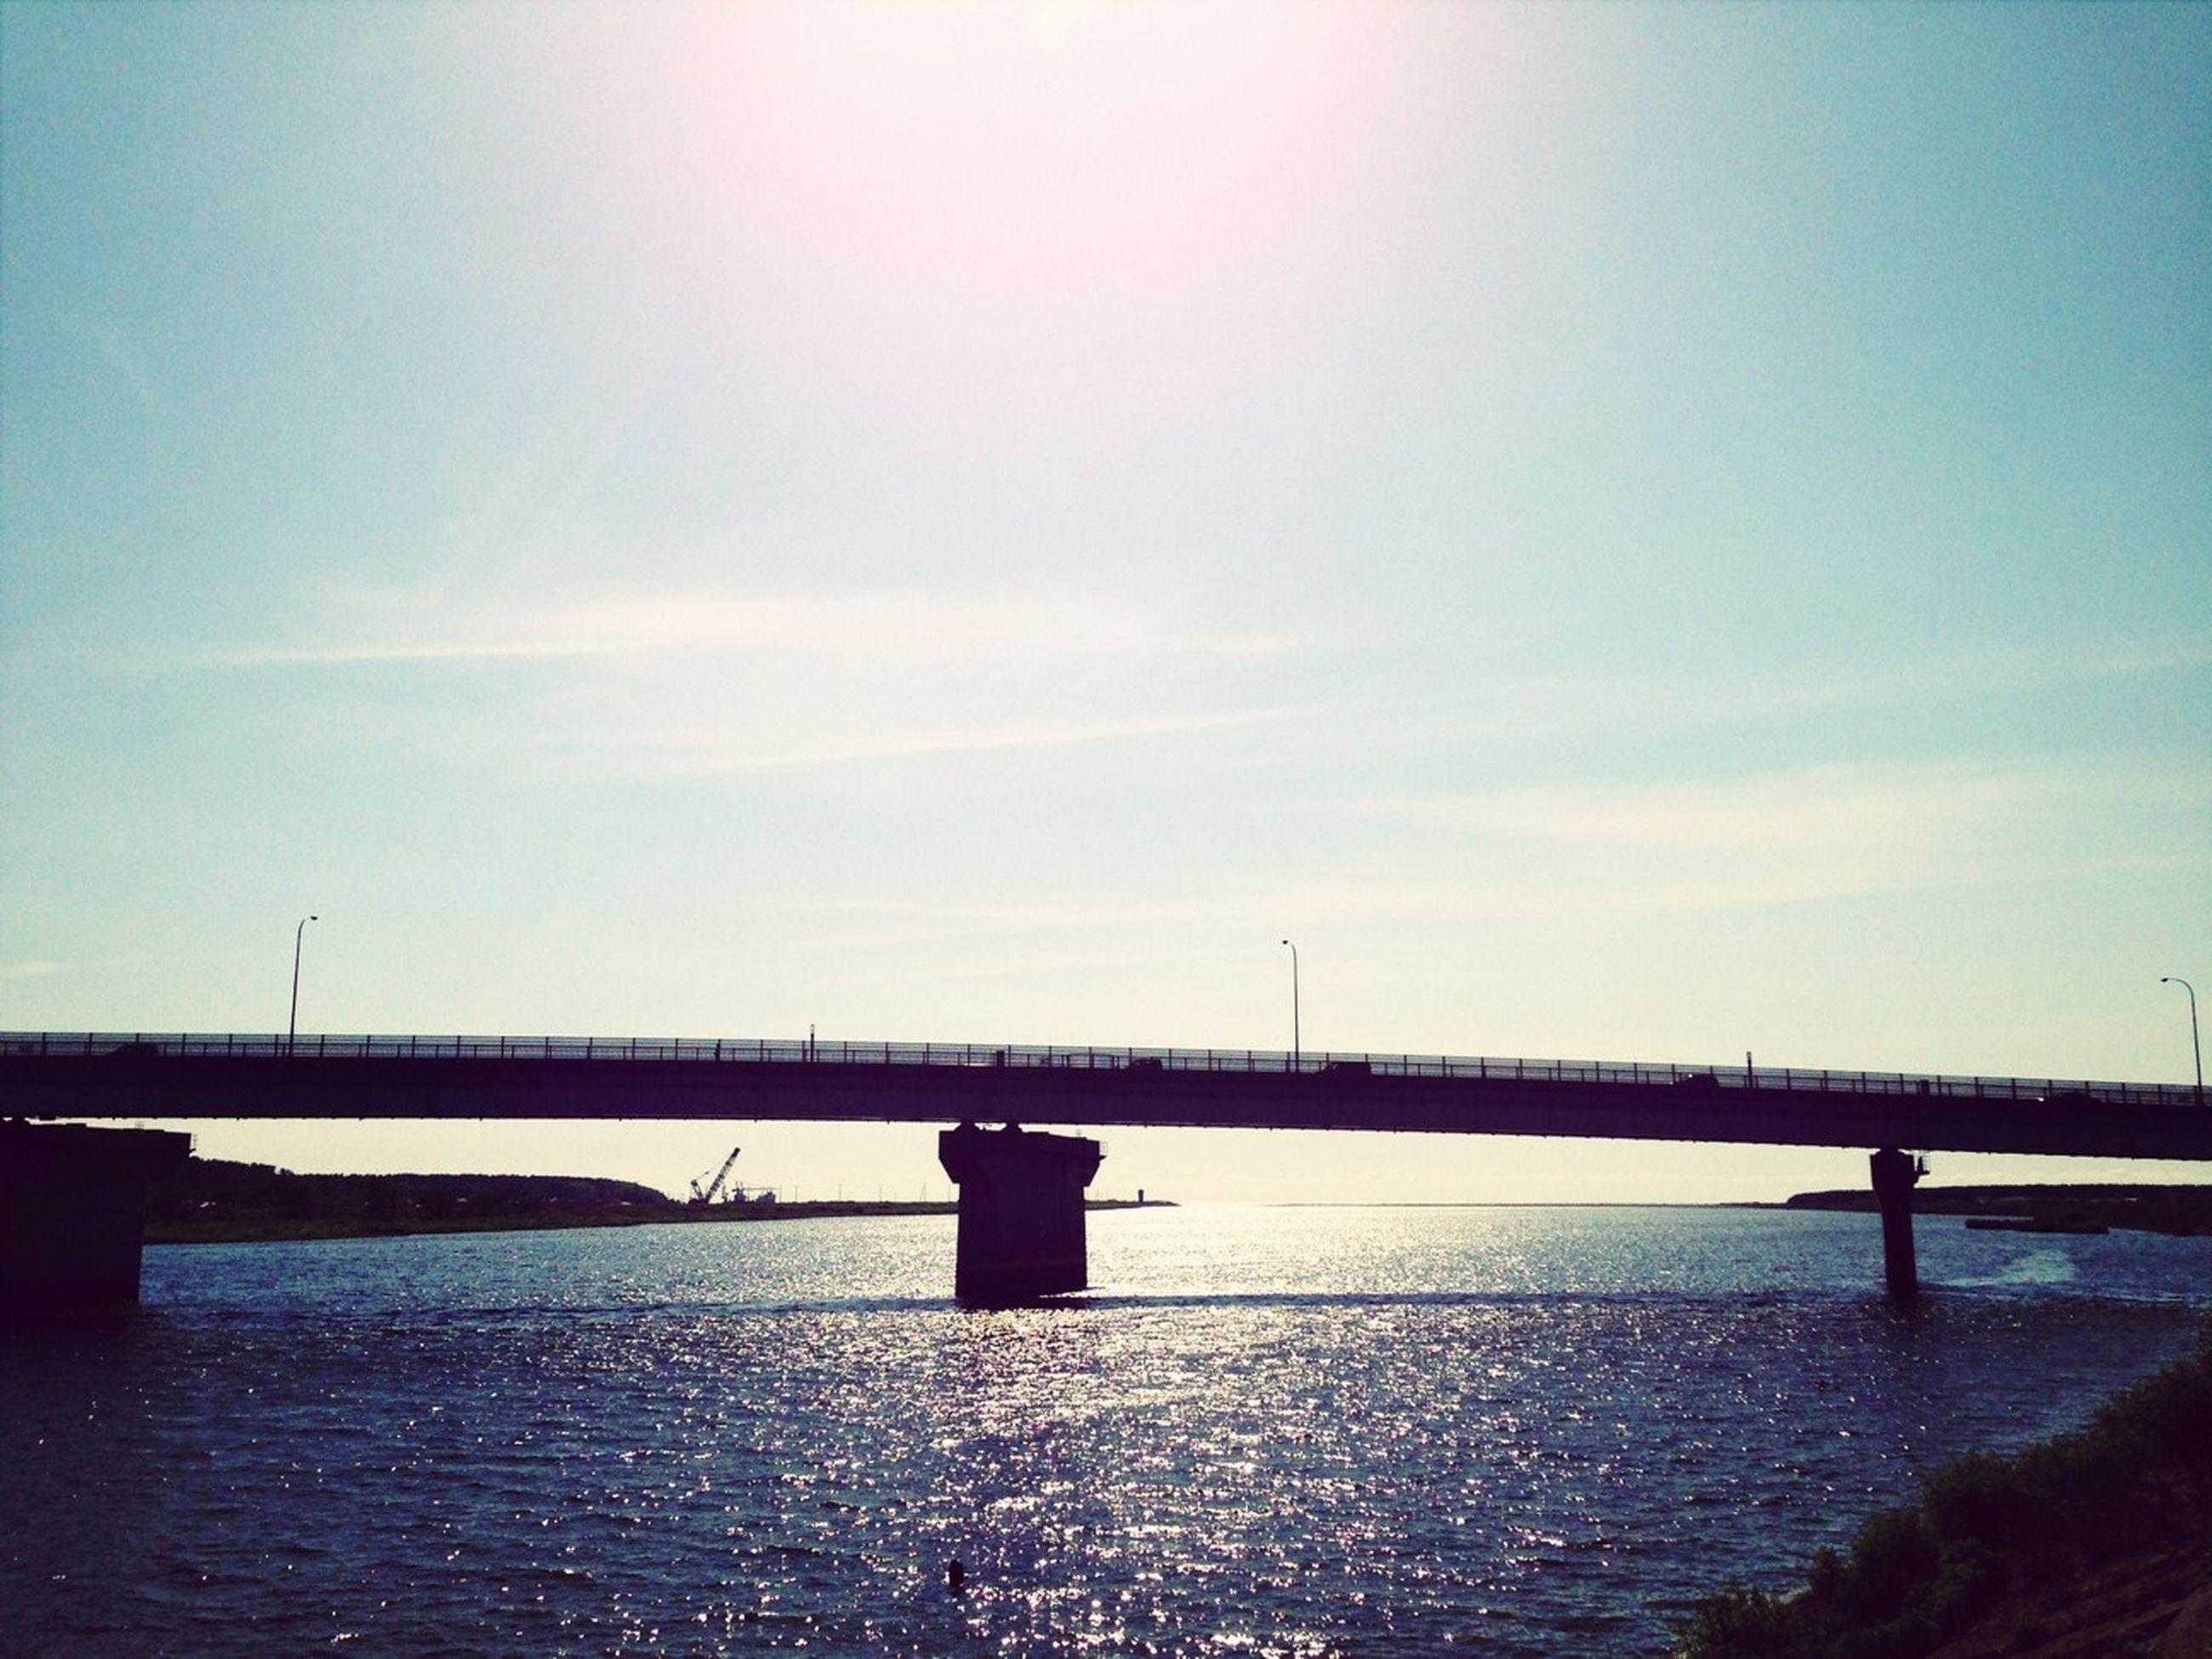 connection, bridge - man made structure, built structure, water, architecture, bridge, river, sky, engineering, waterfront, transportation, rippled, suspension bridge, cloud - sky, tranquility, long, sea, nature, railing, cloud